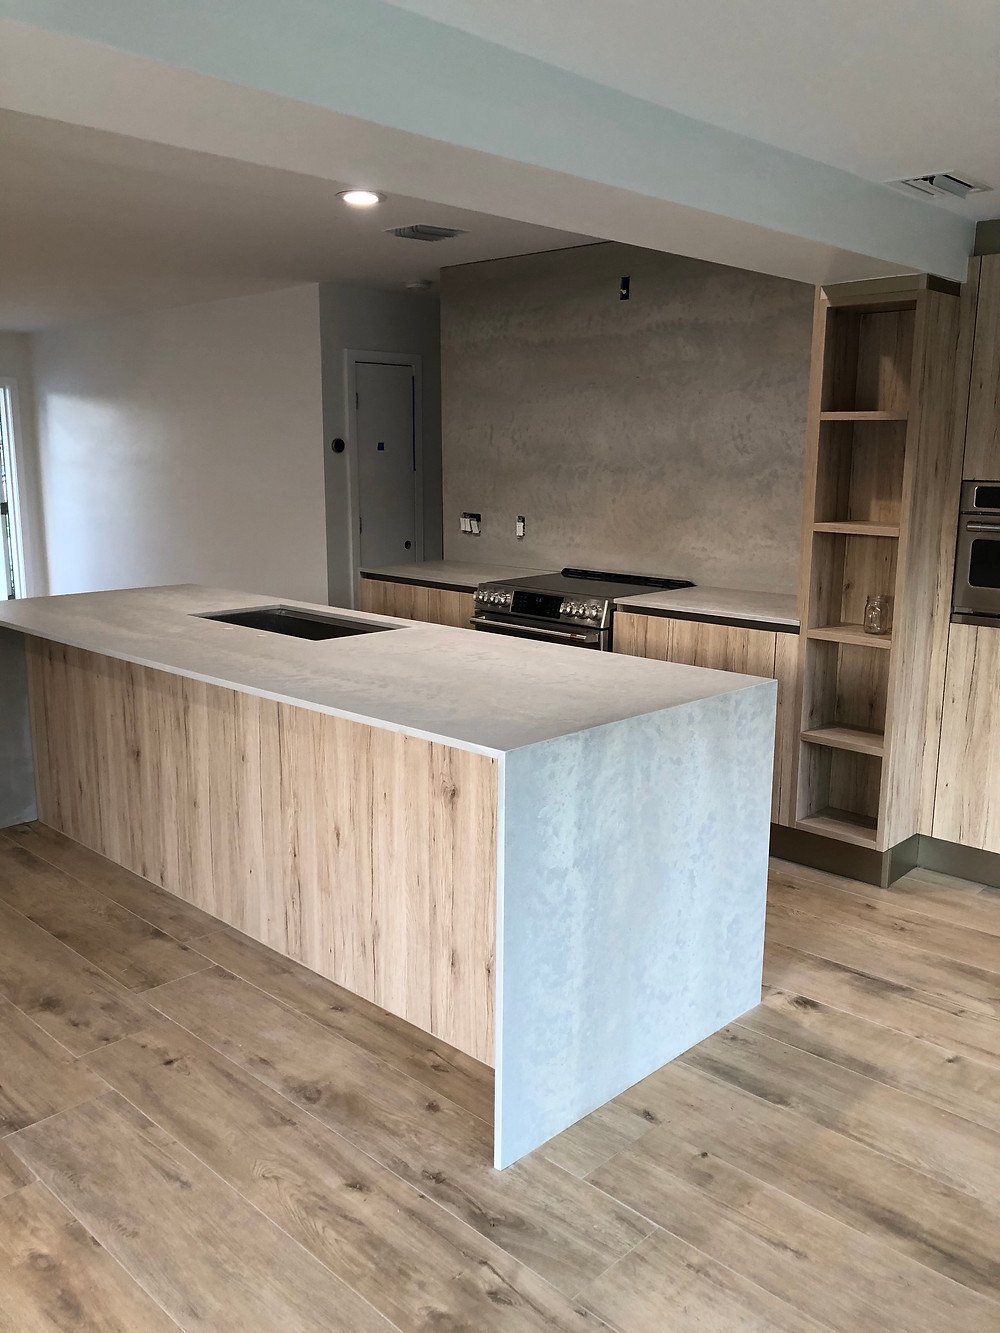 For Caesarstone Primordia quartz countertops feel free to contact the experts Stone and Quartz LLC for Caesarstone countertops | Boca Raton FL